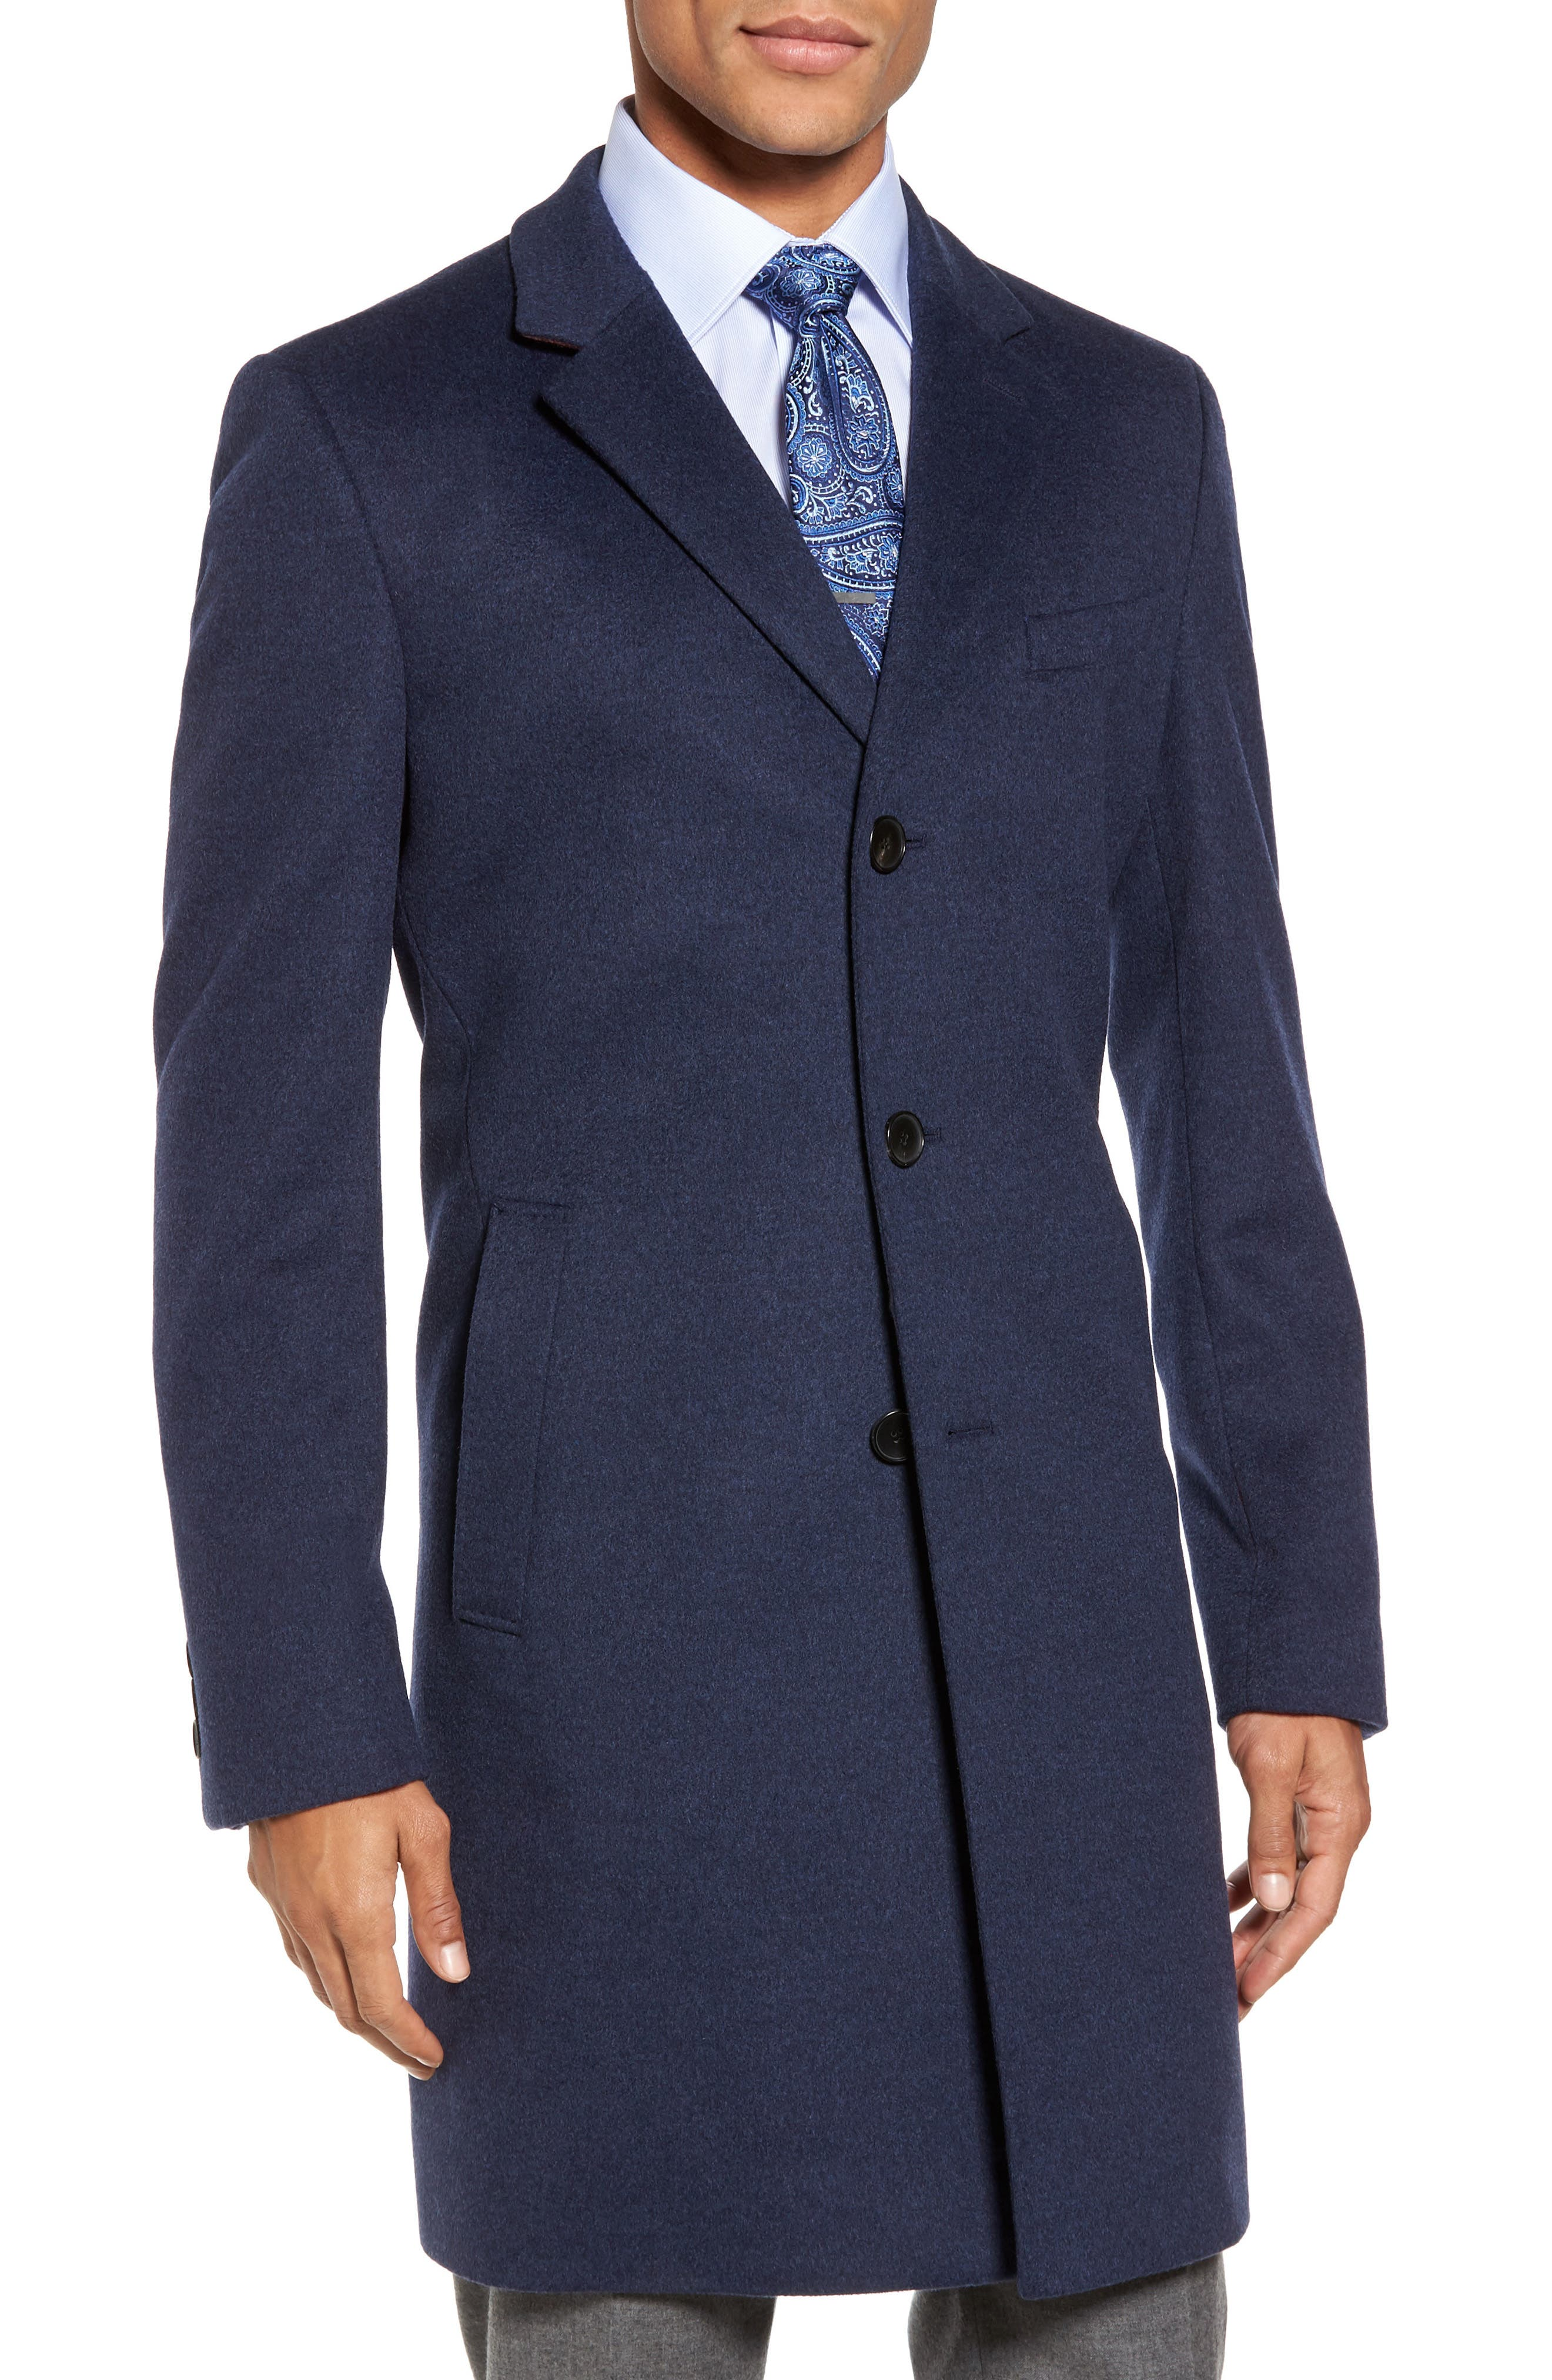 Main Image - BOSS Nye Wool & Cashmere Topcoat